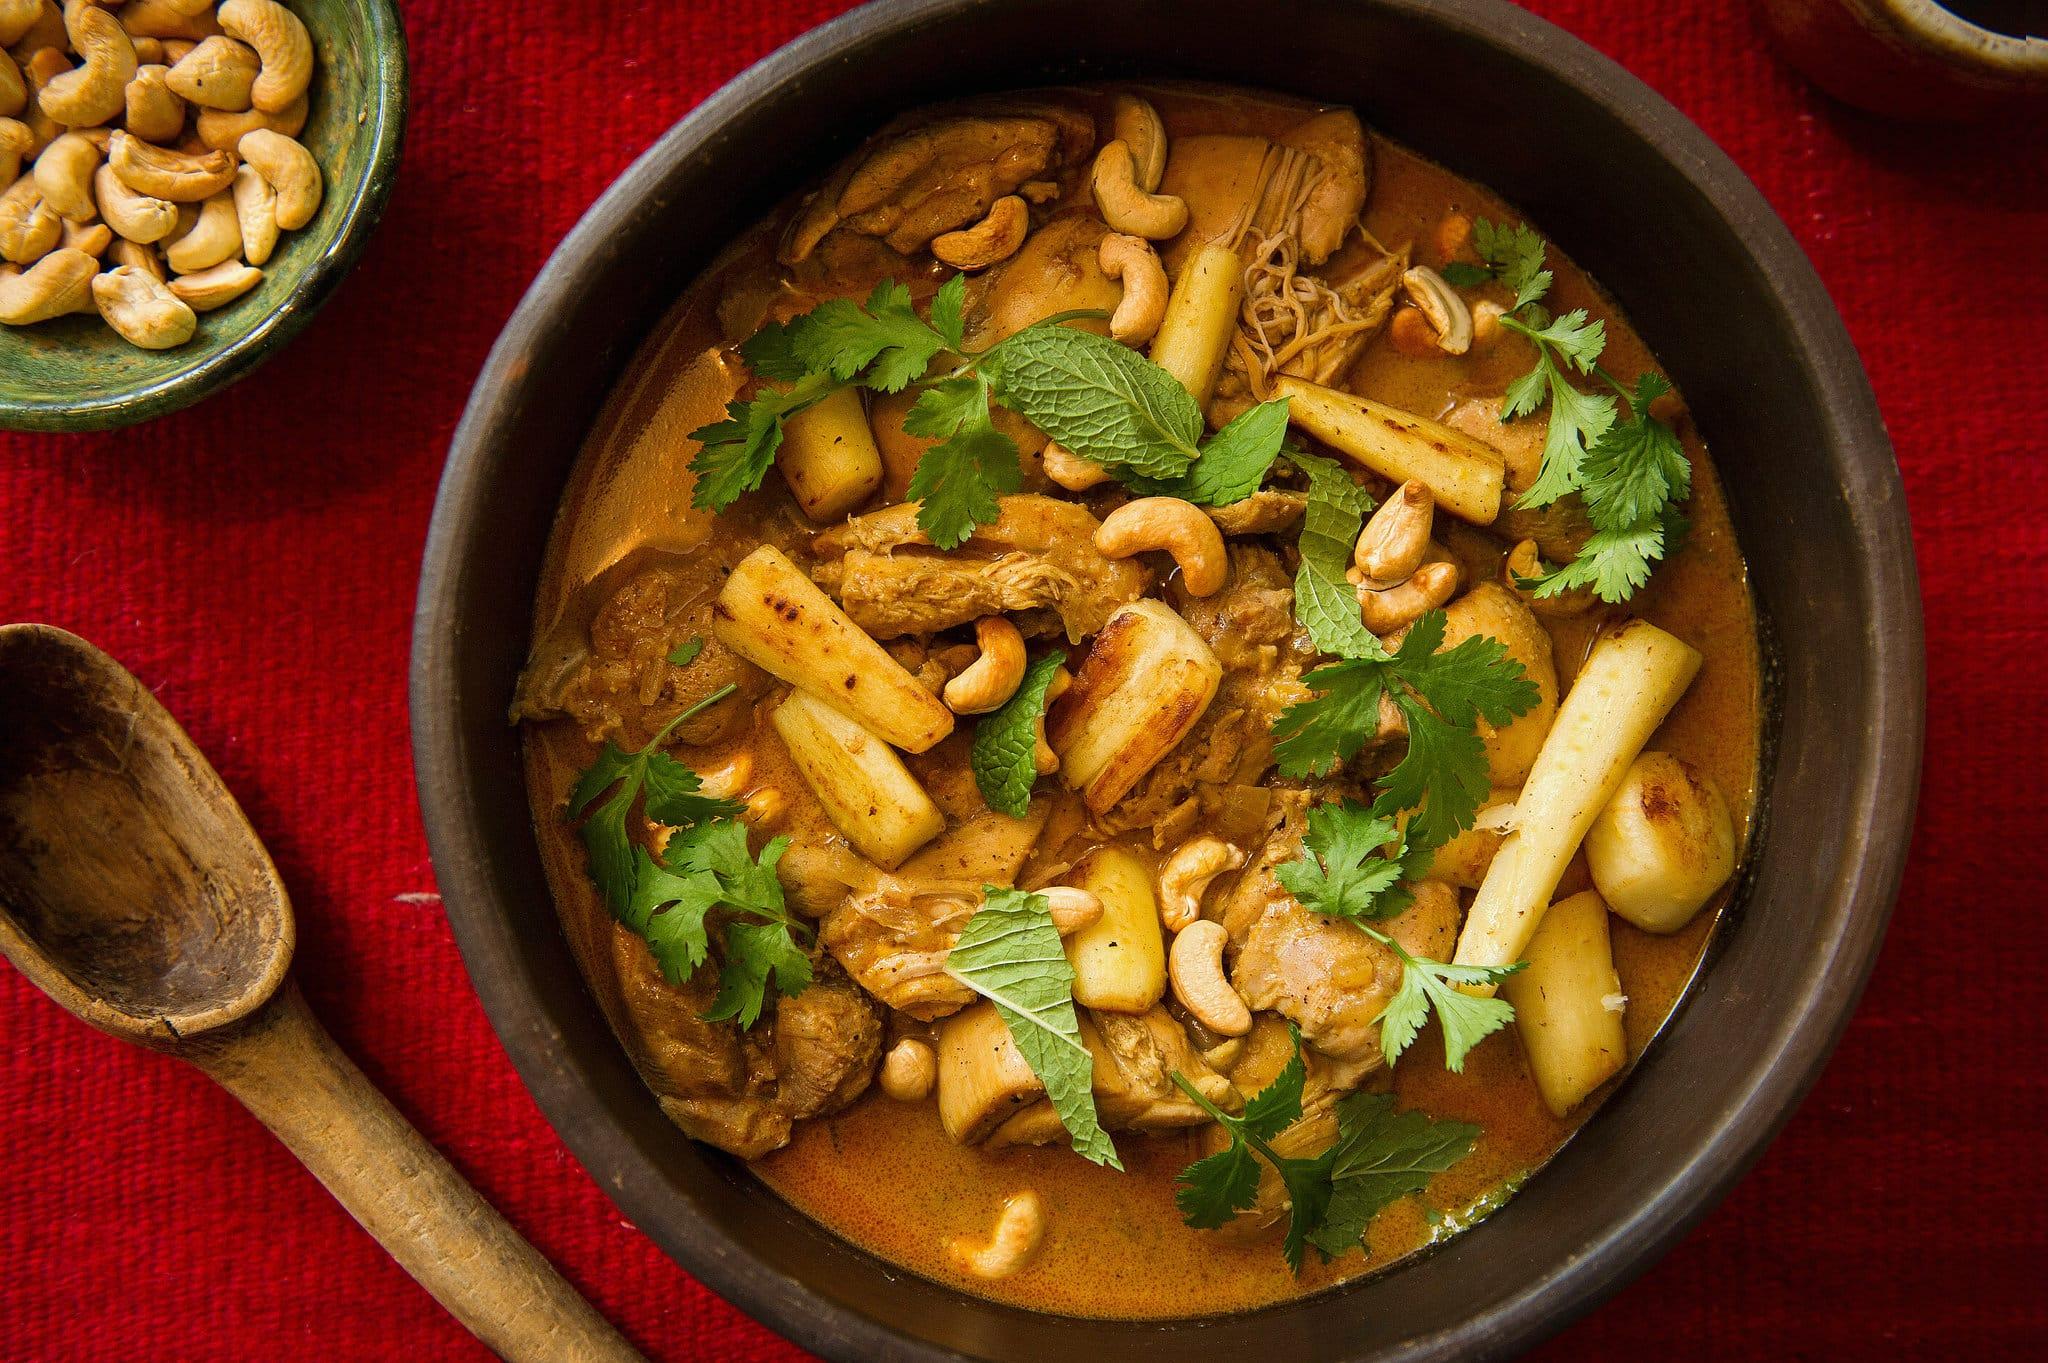 Sri lankan food cuisine talalla house for Authentic sri lankan cuisine